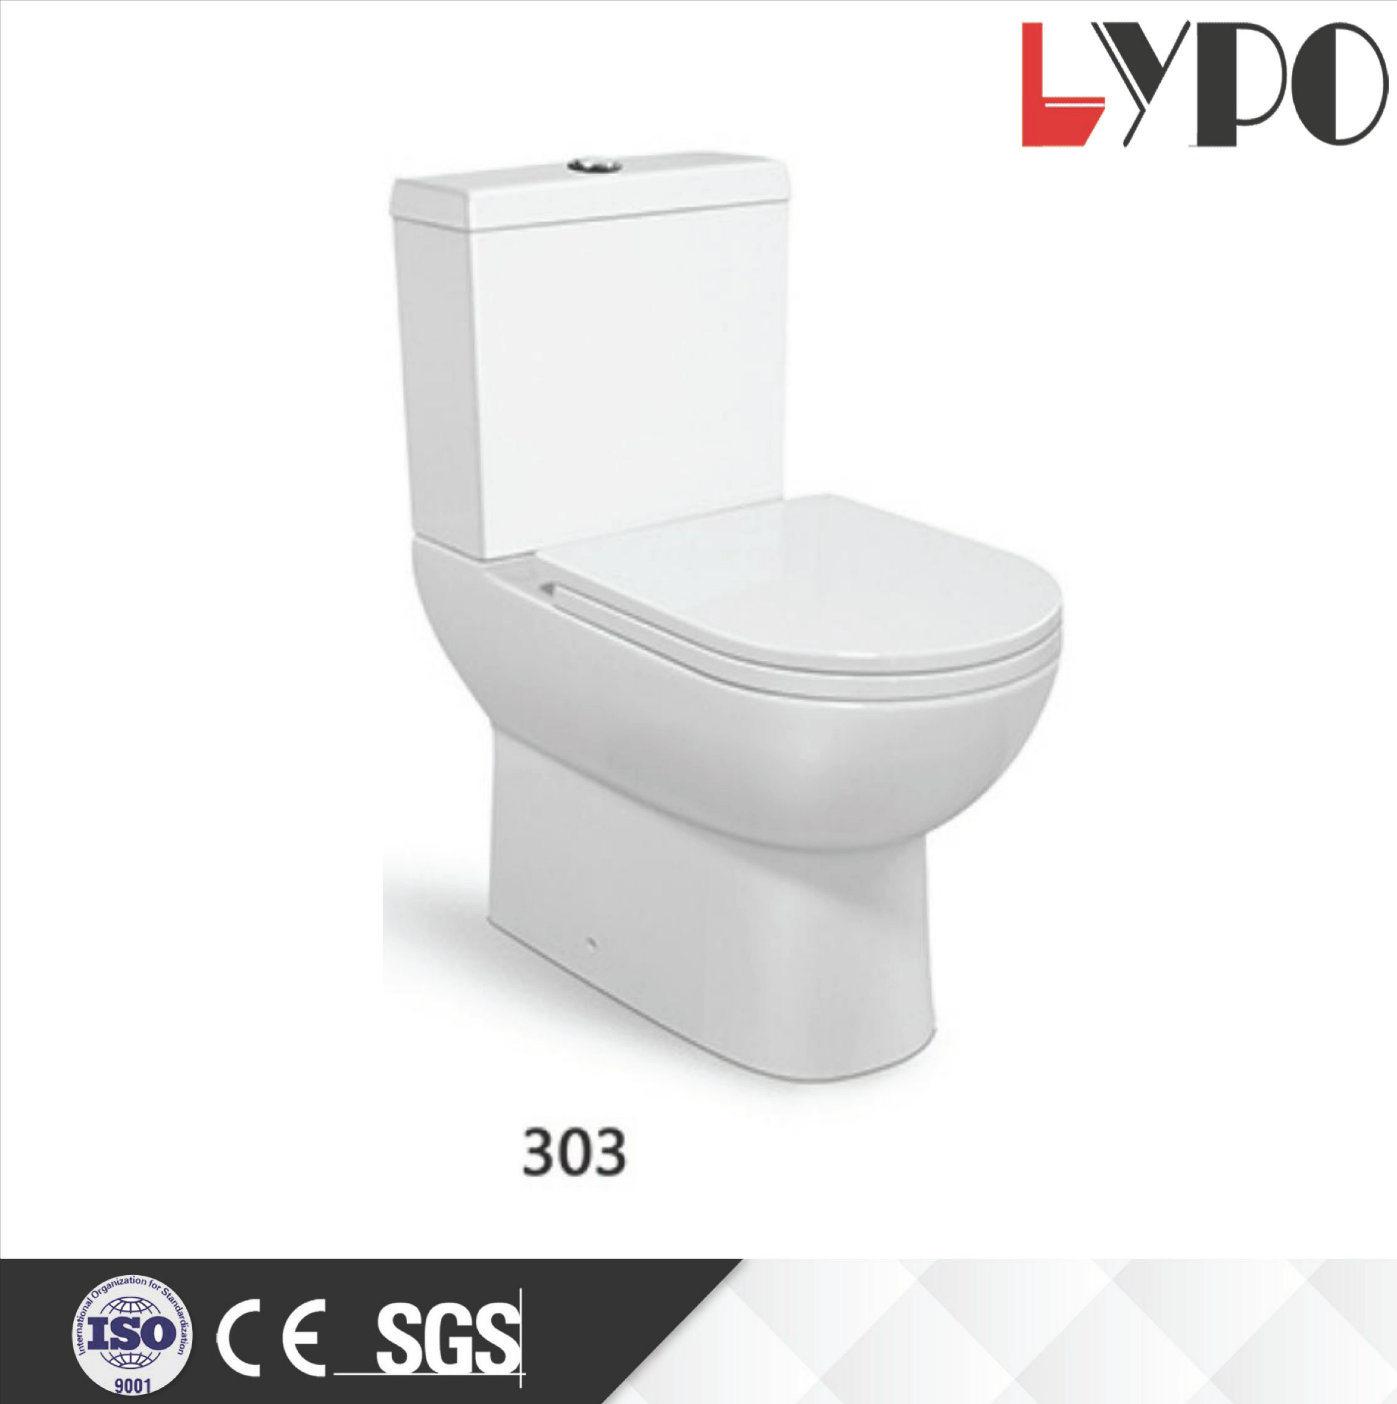 China Lp2105 Ceramic Washdown Two Piece Wc Toilet Bowl Price - China ...